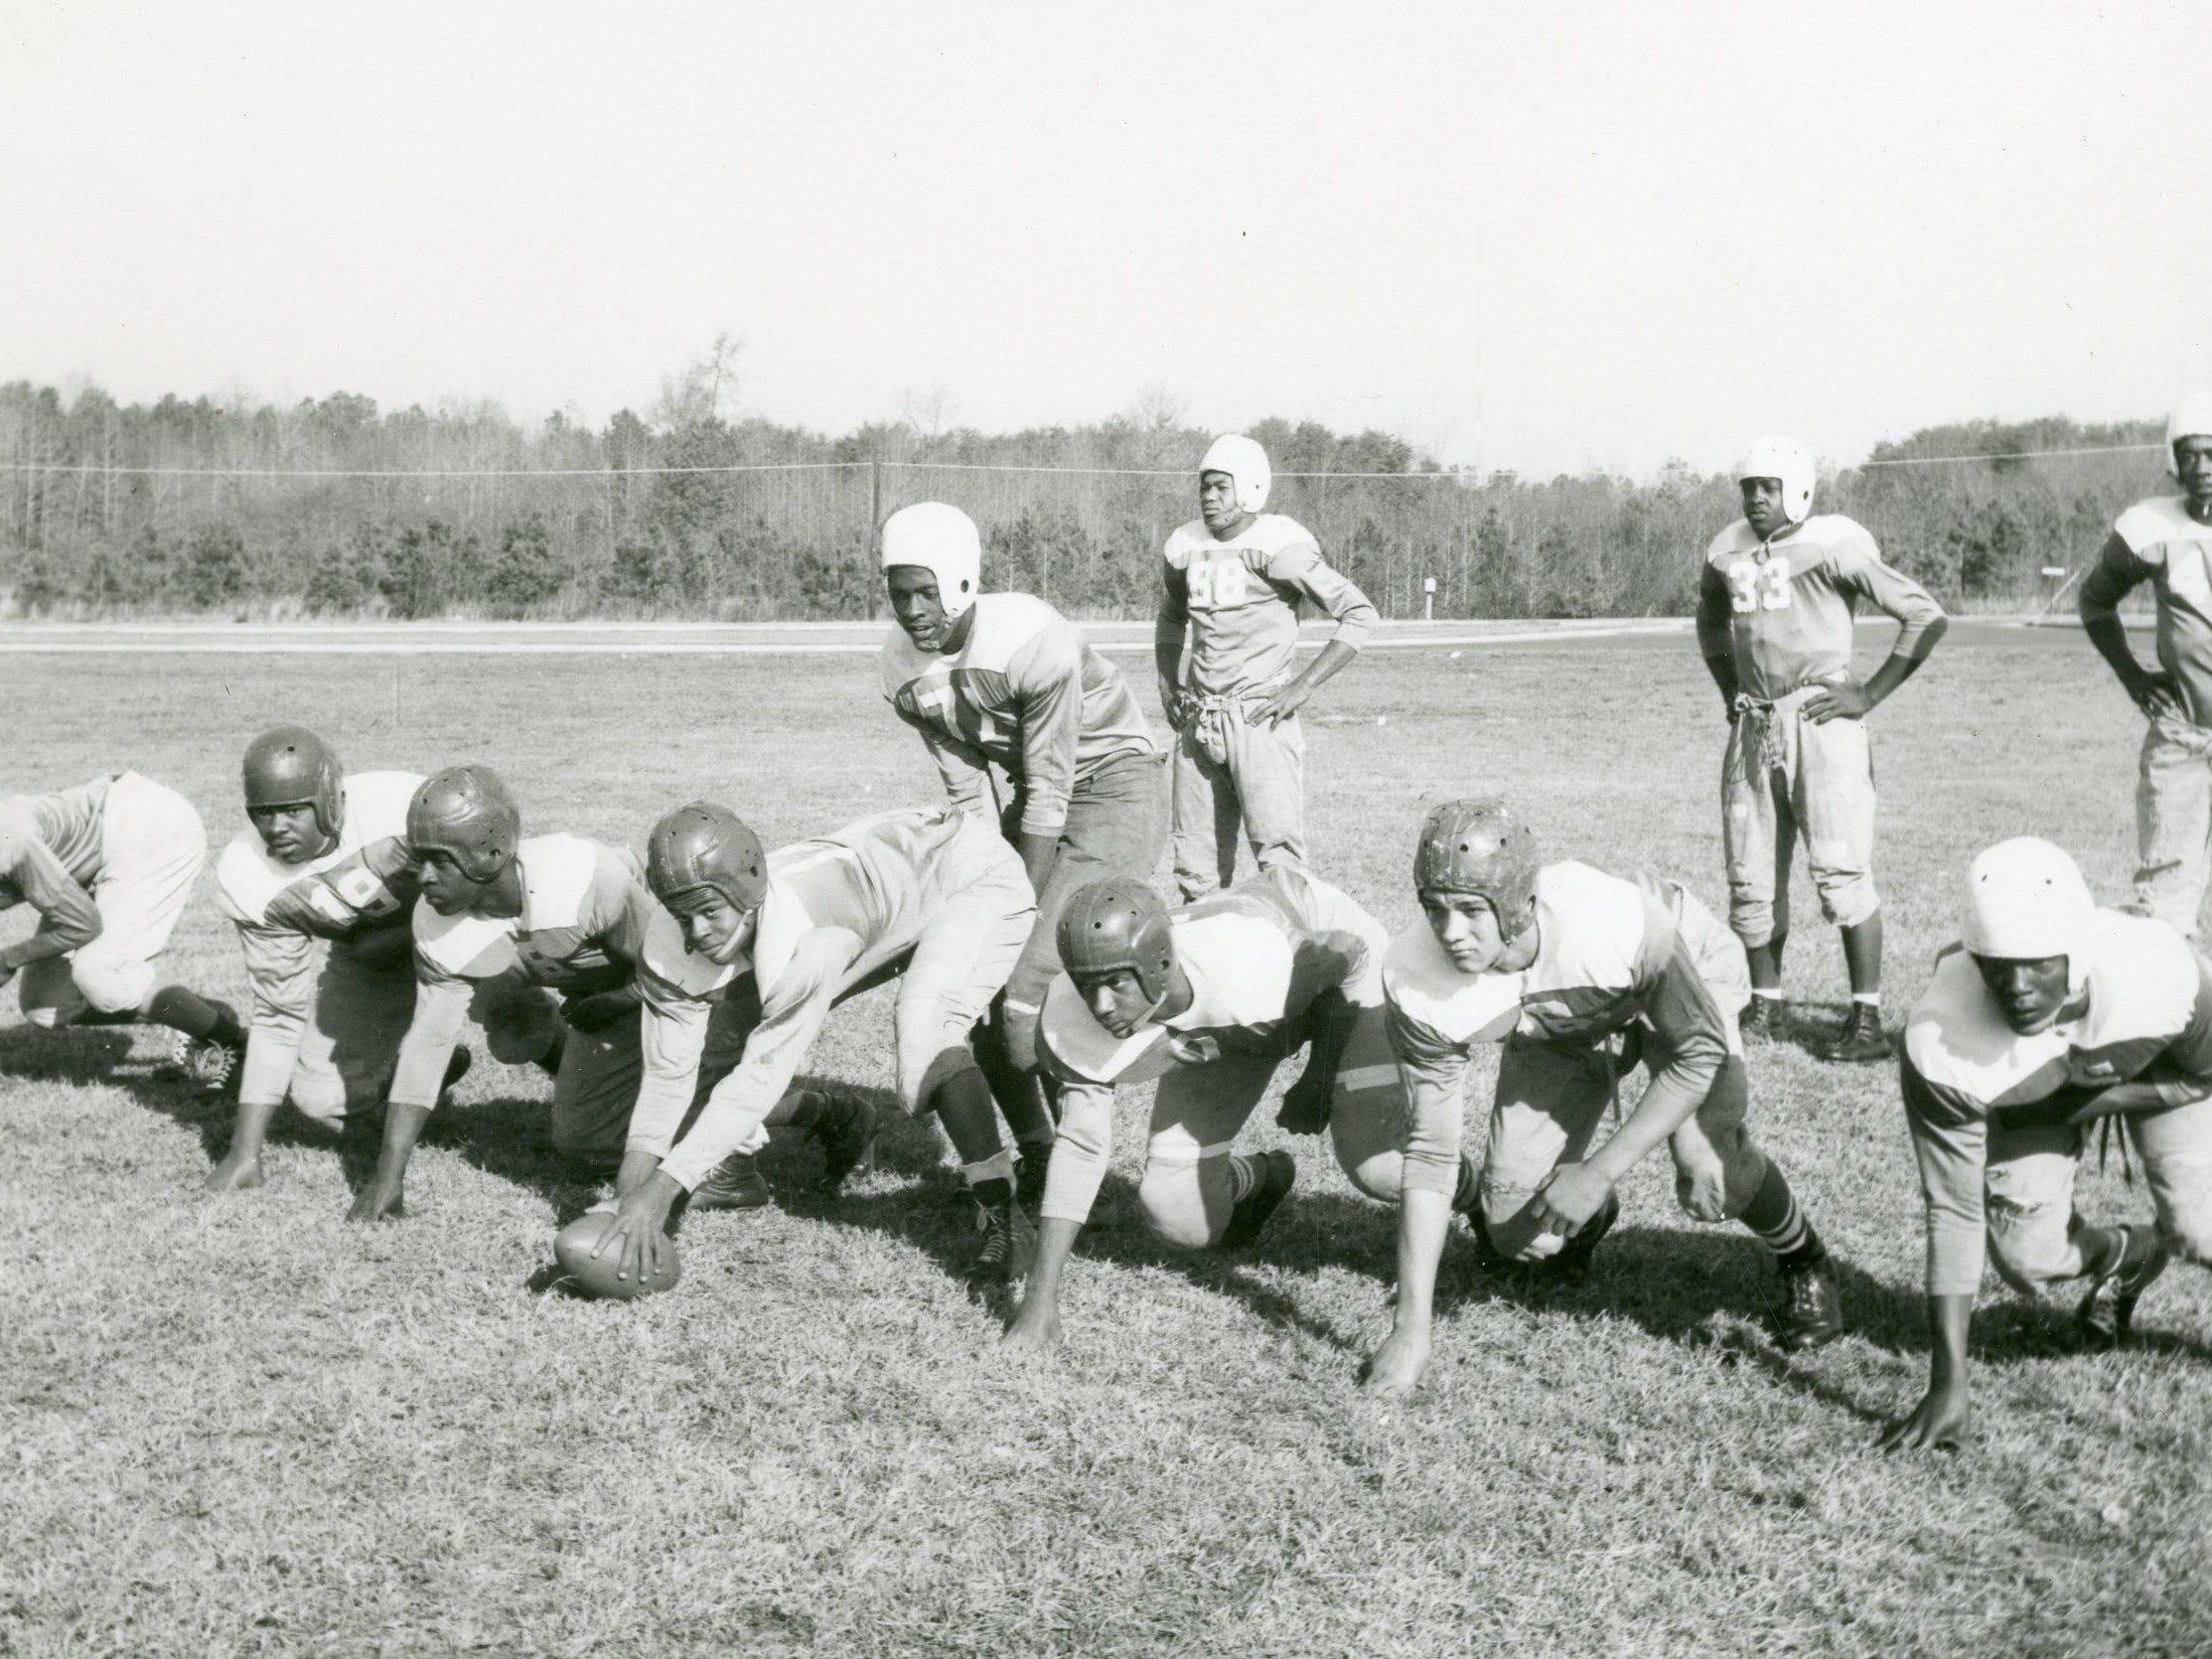 The William C. Jayson High School in Georgetown football team.